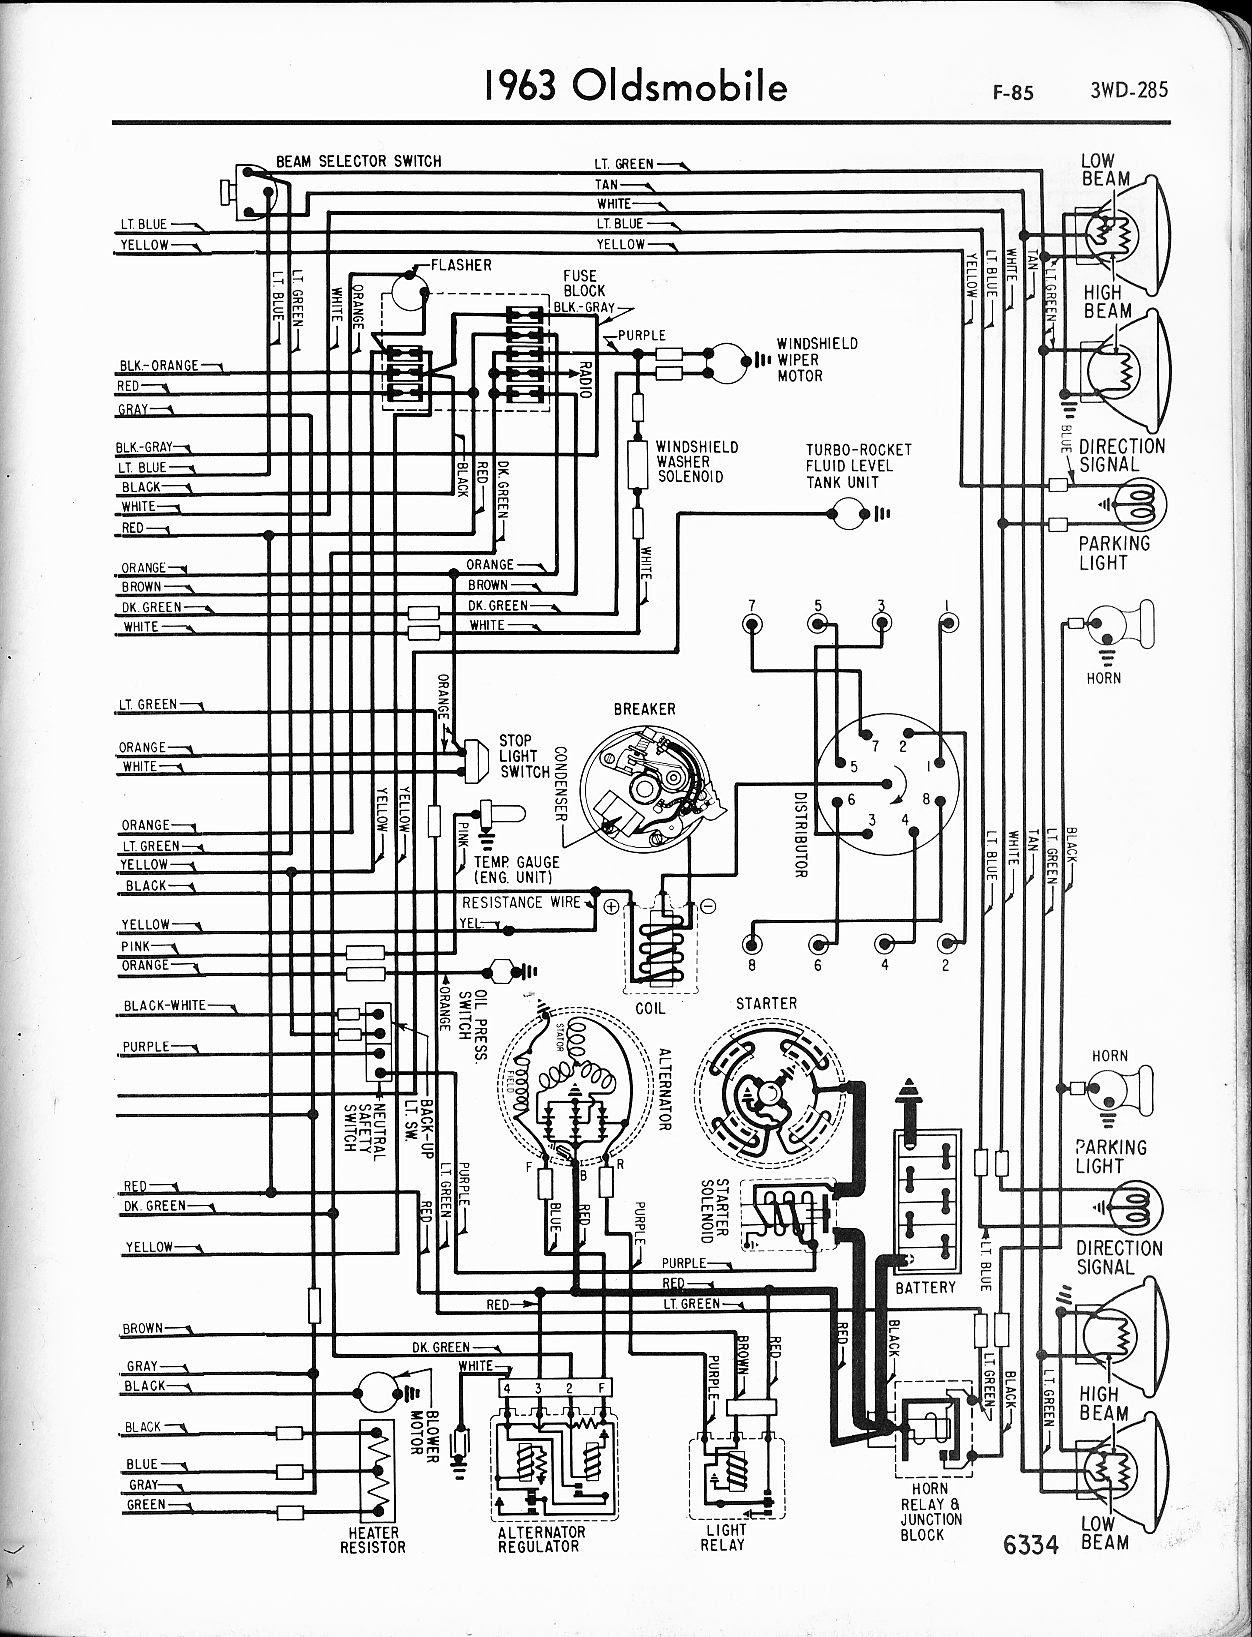 1999 Oldsmobile Cutlass Supreme Radio Wiring Diagram Fasco D7909 Wiring Diagram Coorsaa Sehidup Jeanjaures37 Fr